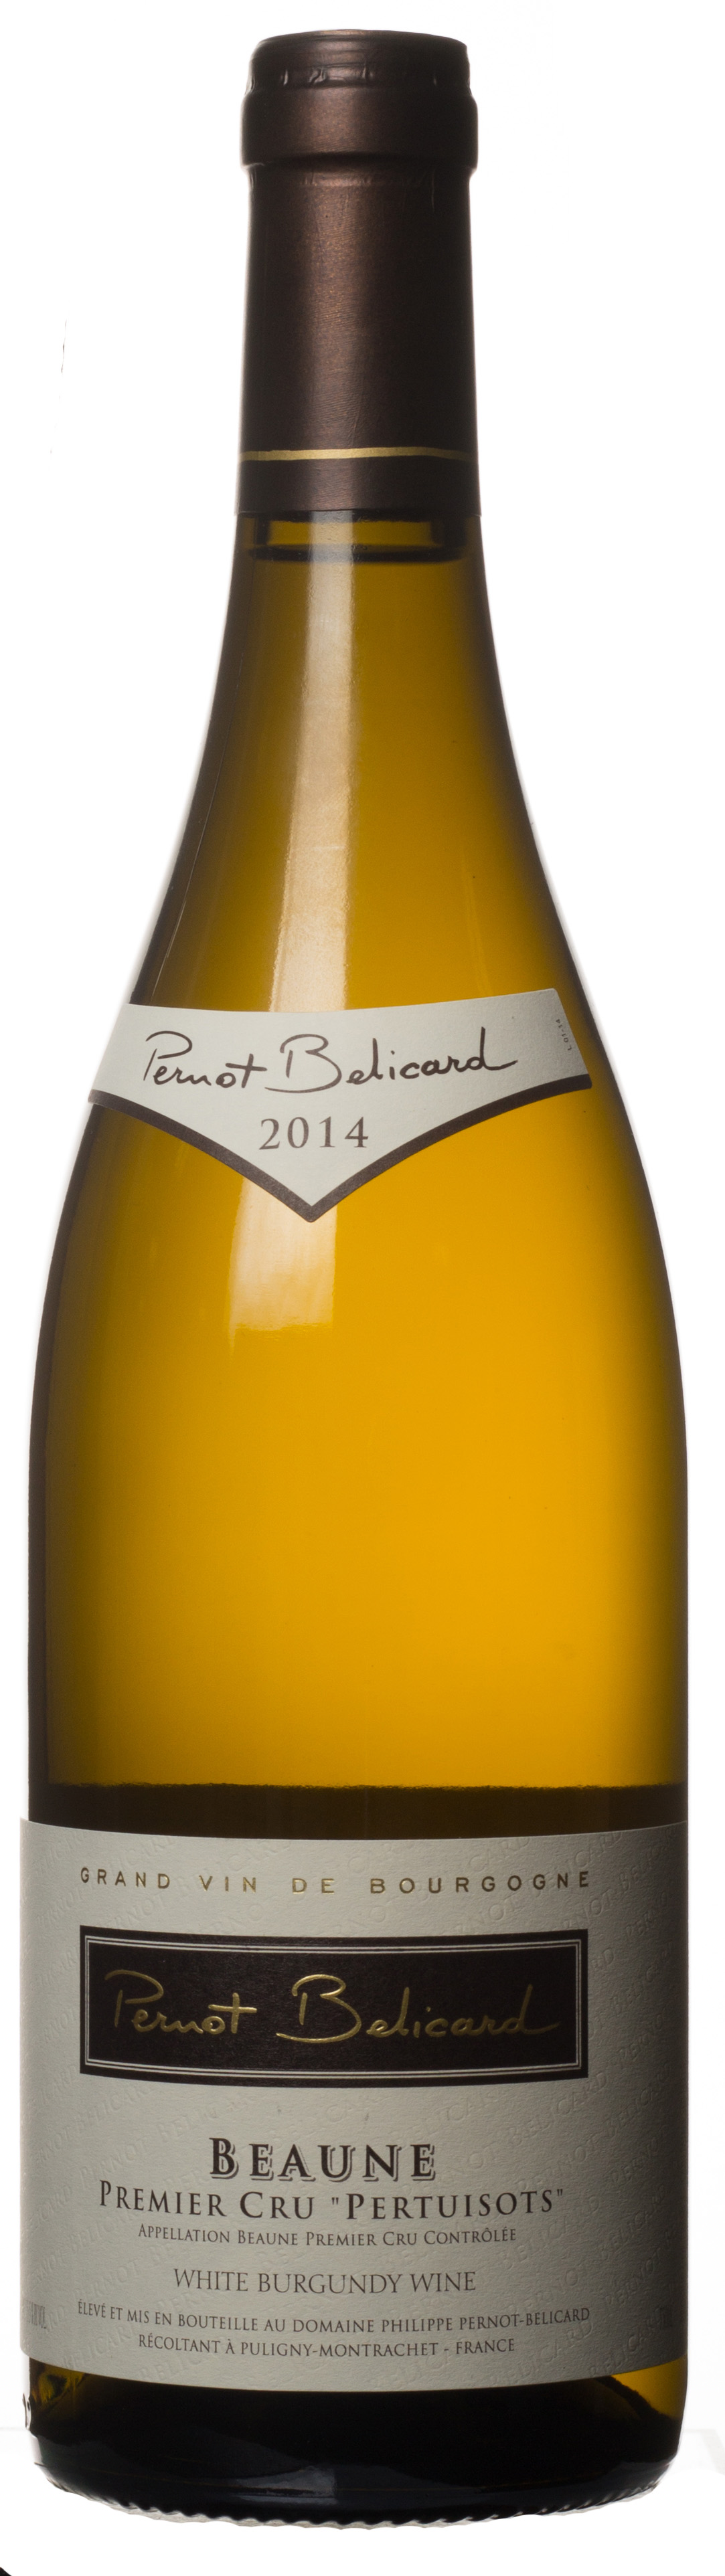 2014 Domaine Pernot Belicard Beaune 1er Cru Pertuisots Bottle